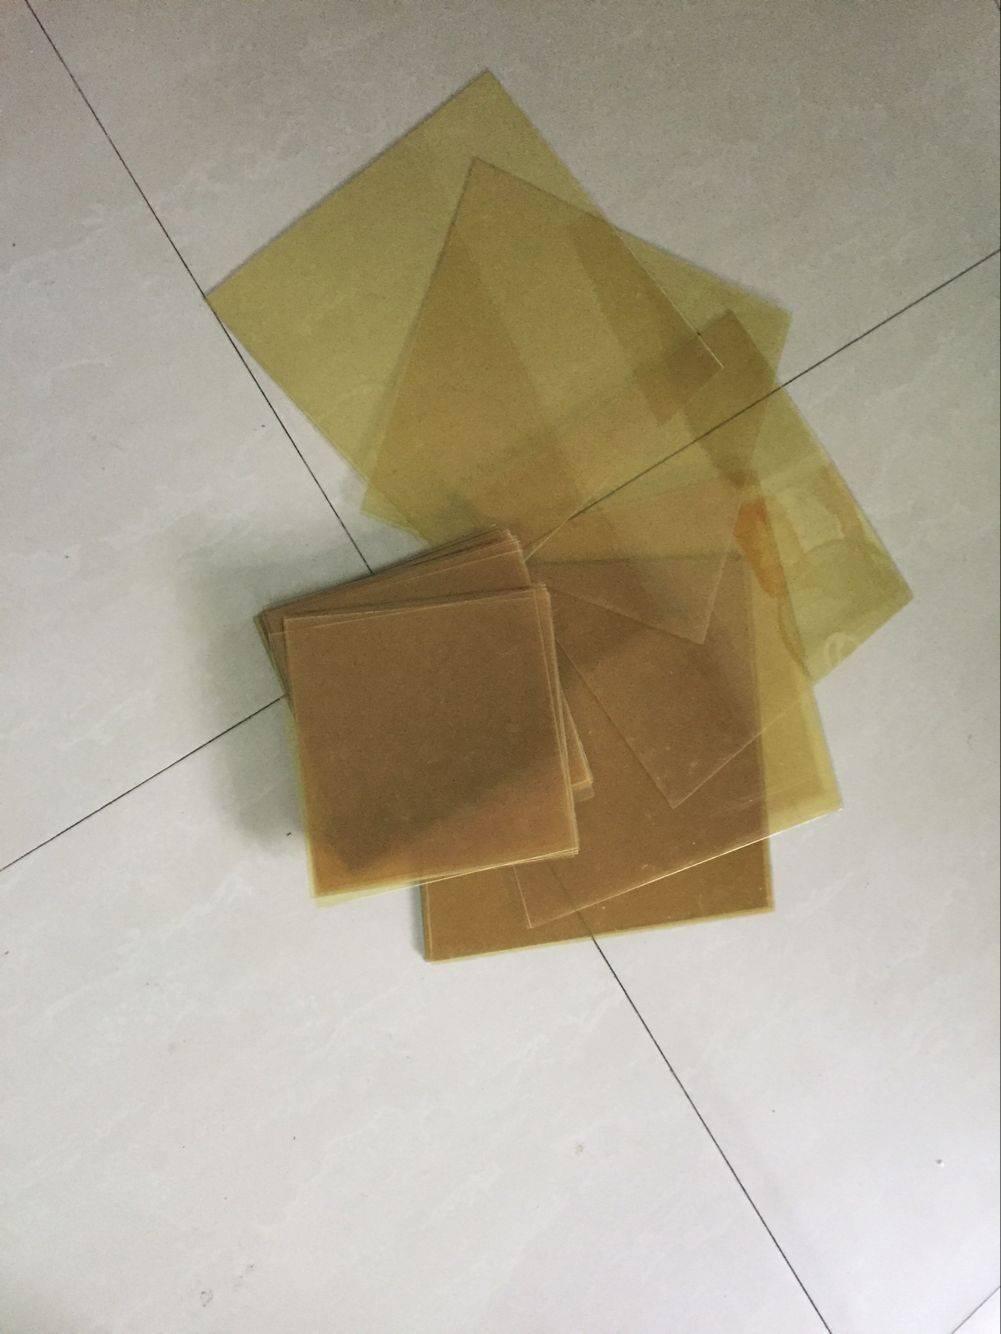 PEI polyetherimide sheet